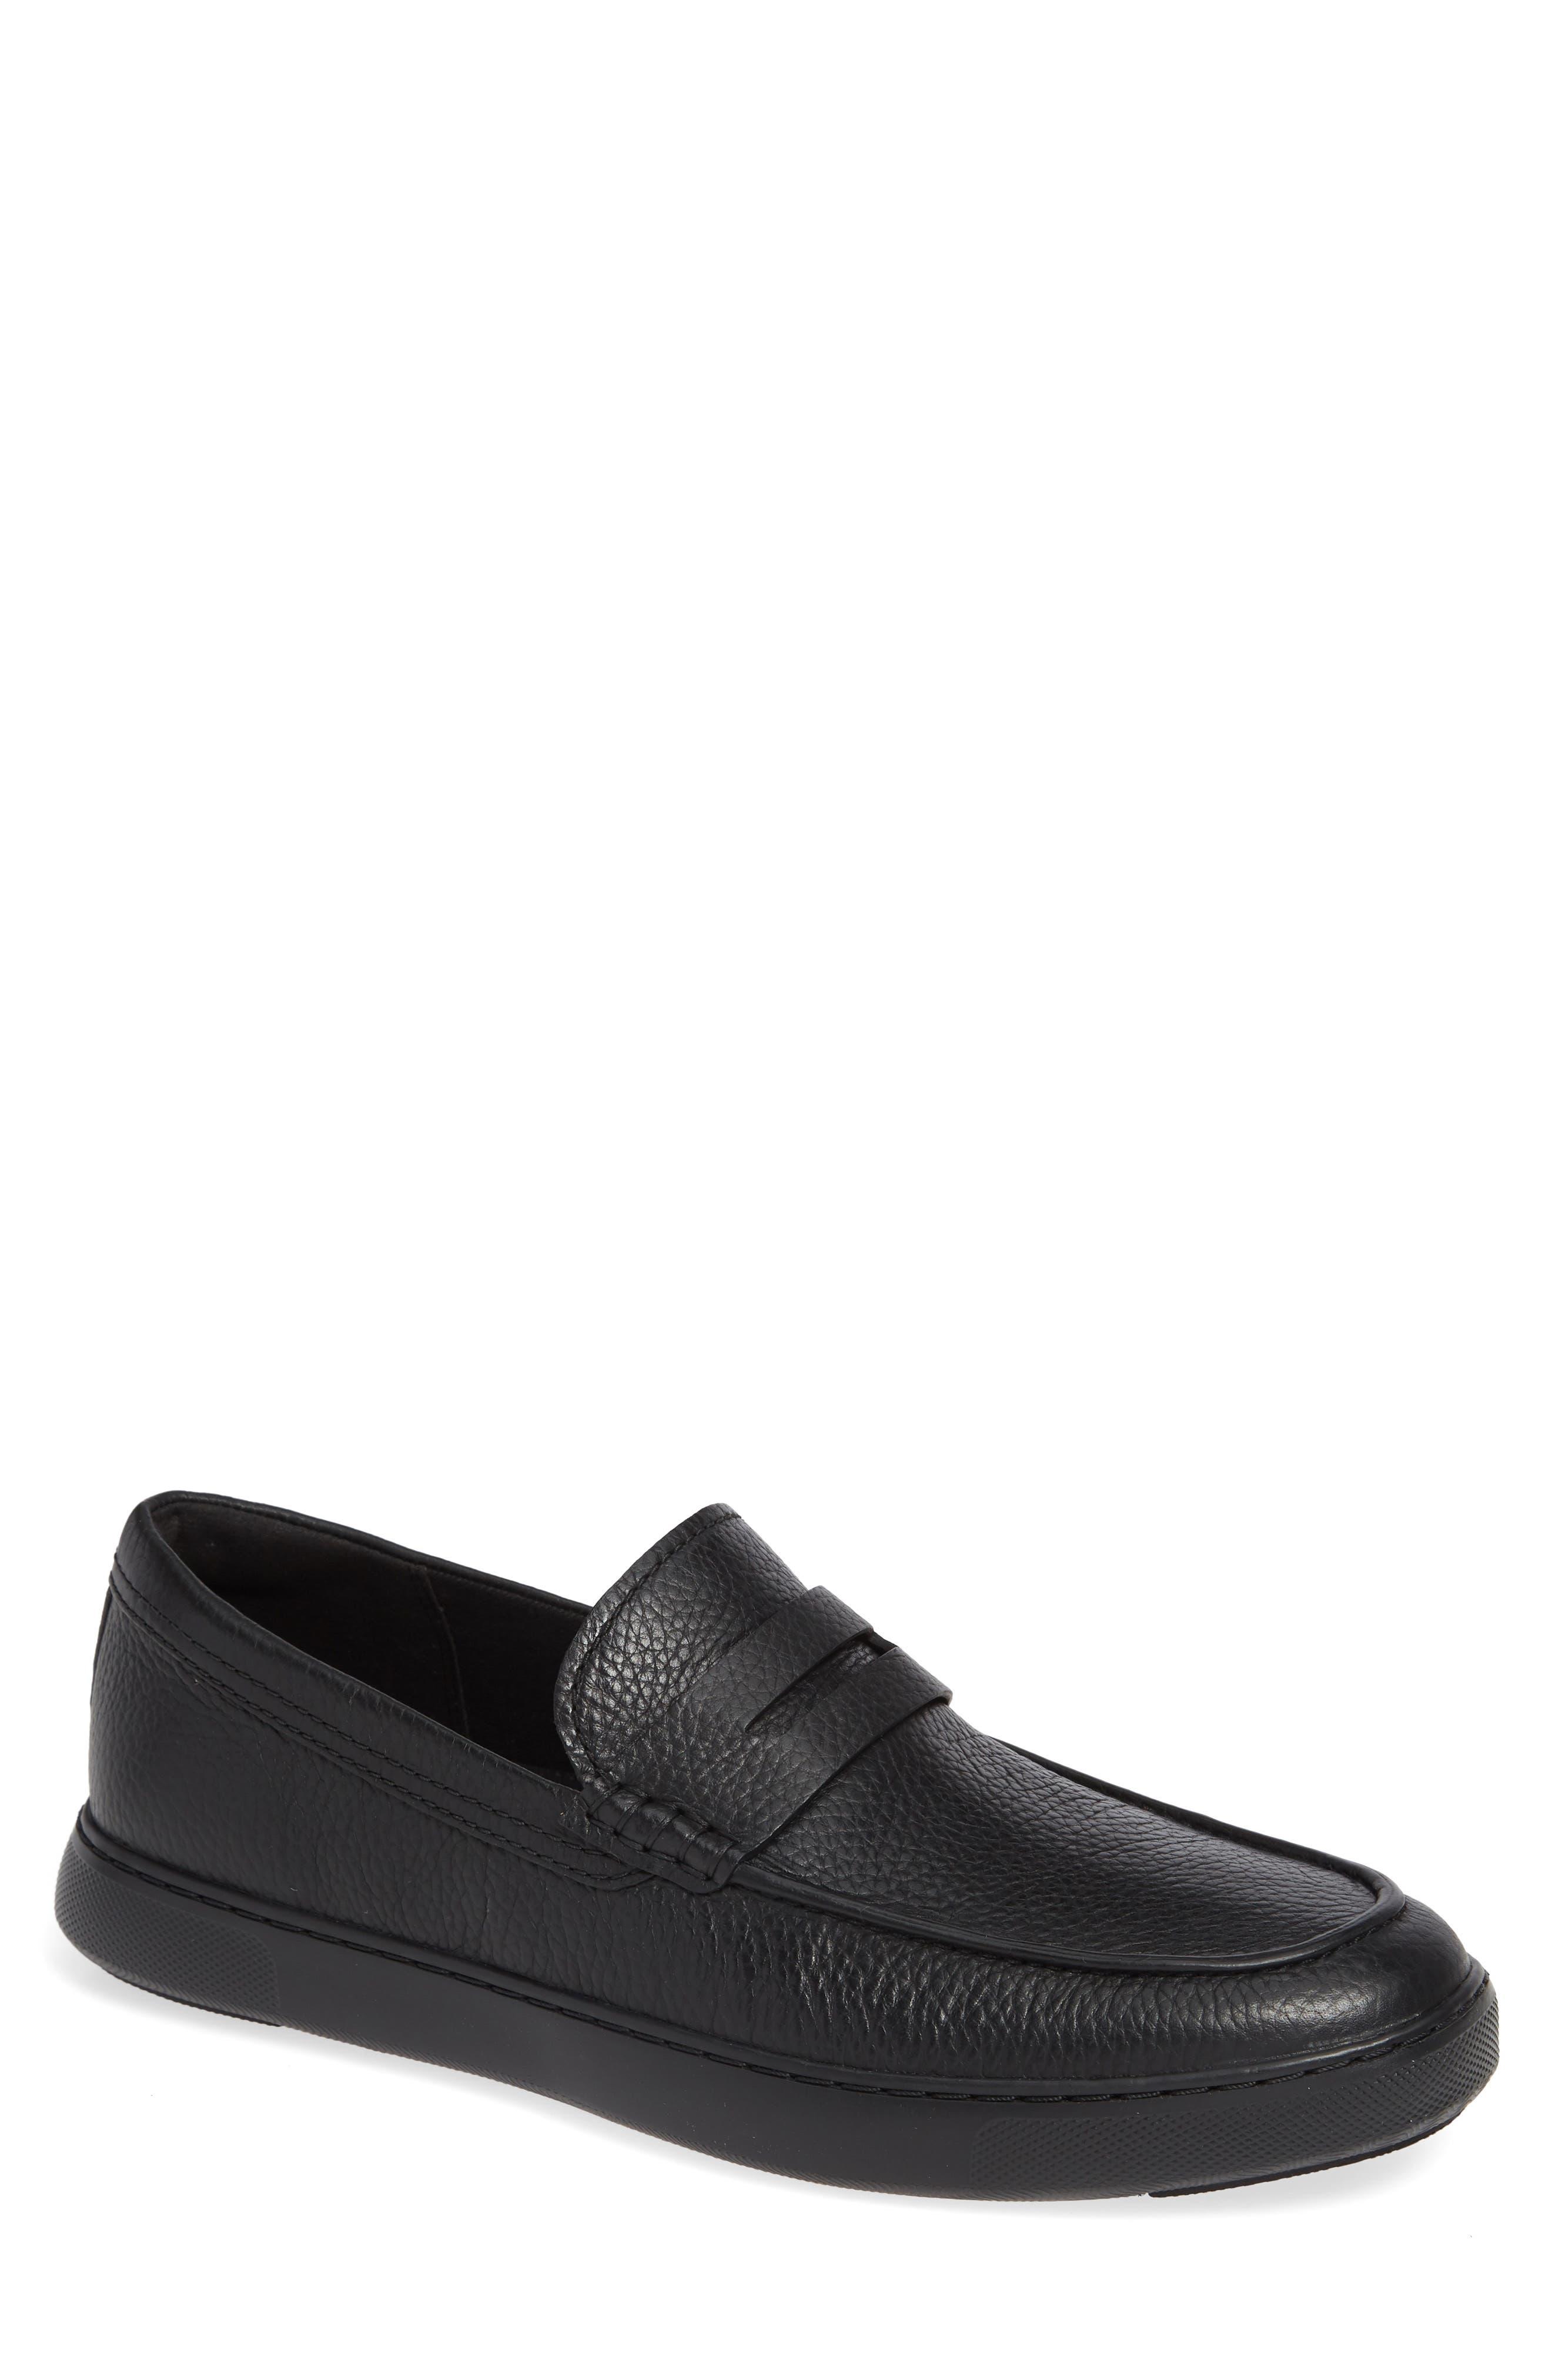 Boston Moc Toe Penny Loafer,                         Main,                         color, BLACK